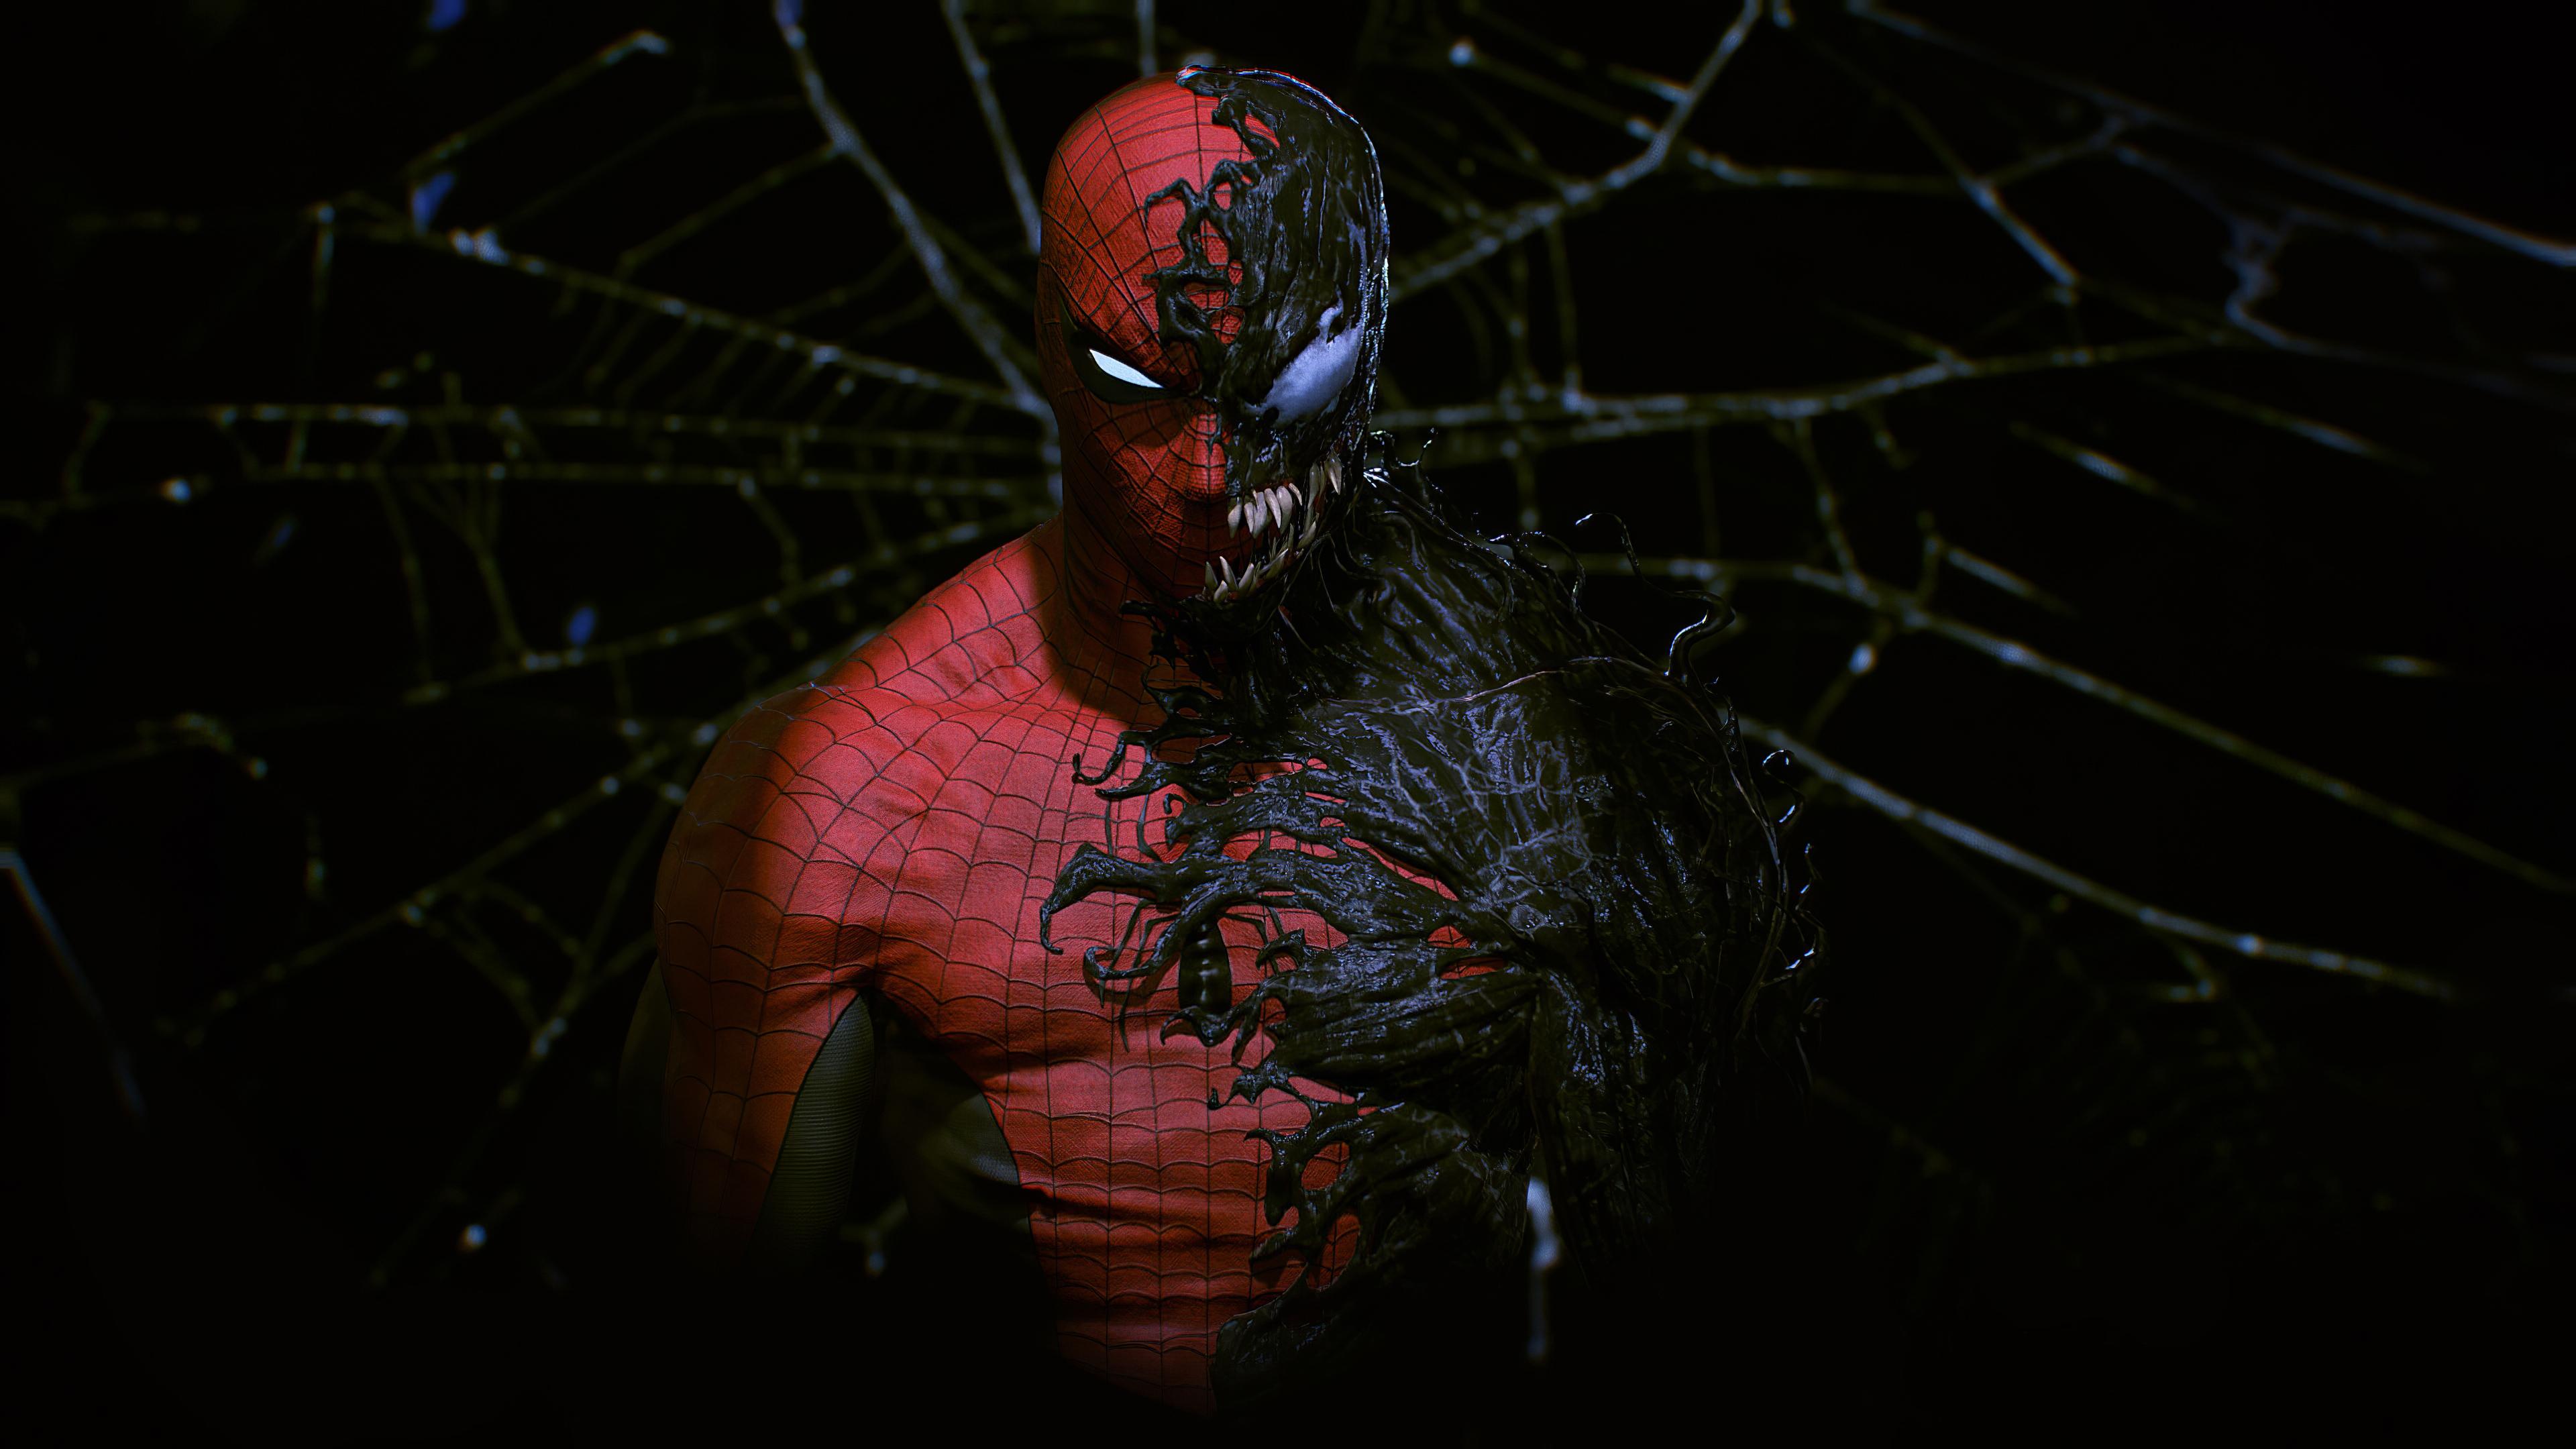 Spider Man And Venom Pc Wallpaper 4k Heroscreen Cool Wallpapers